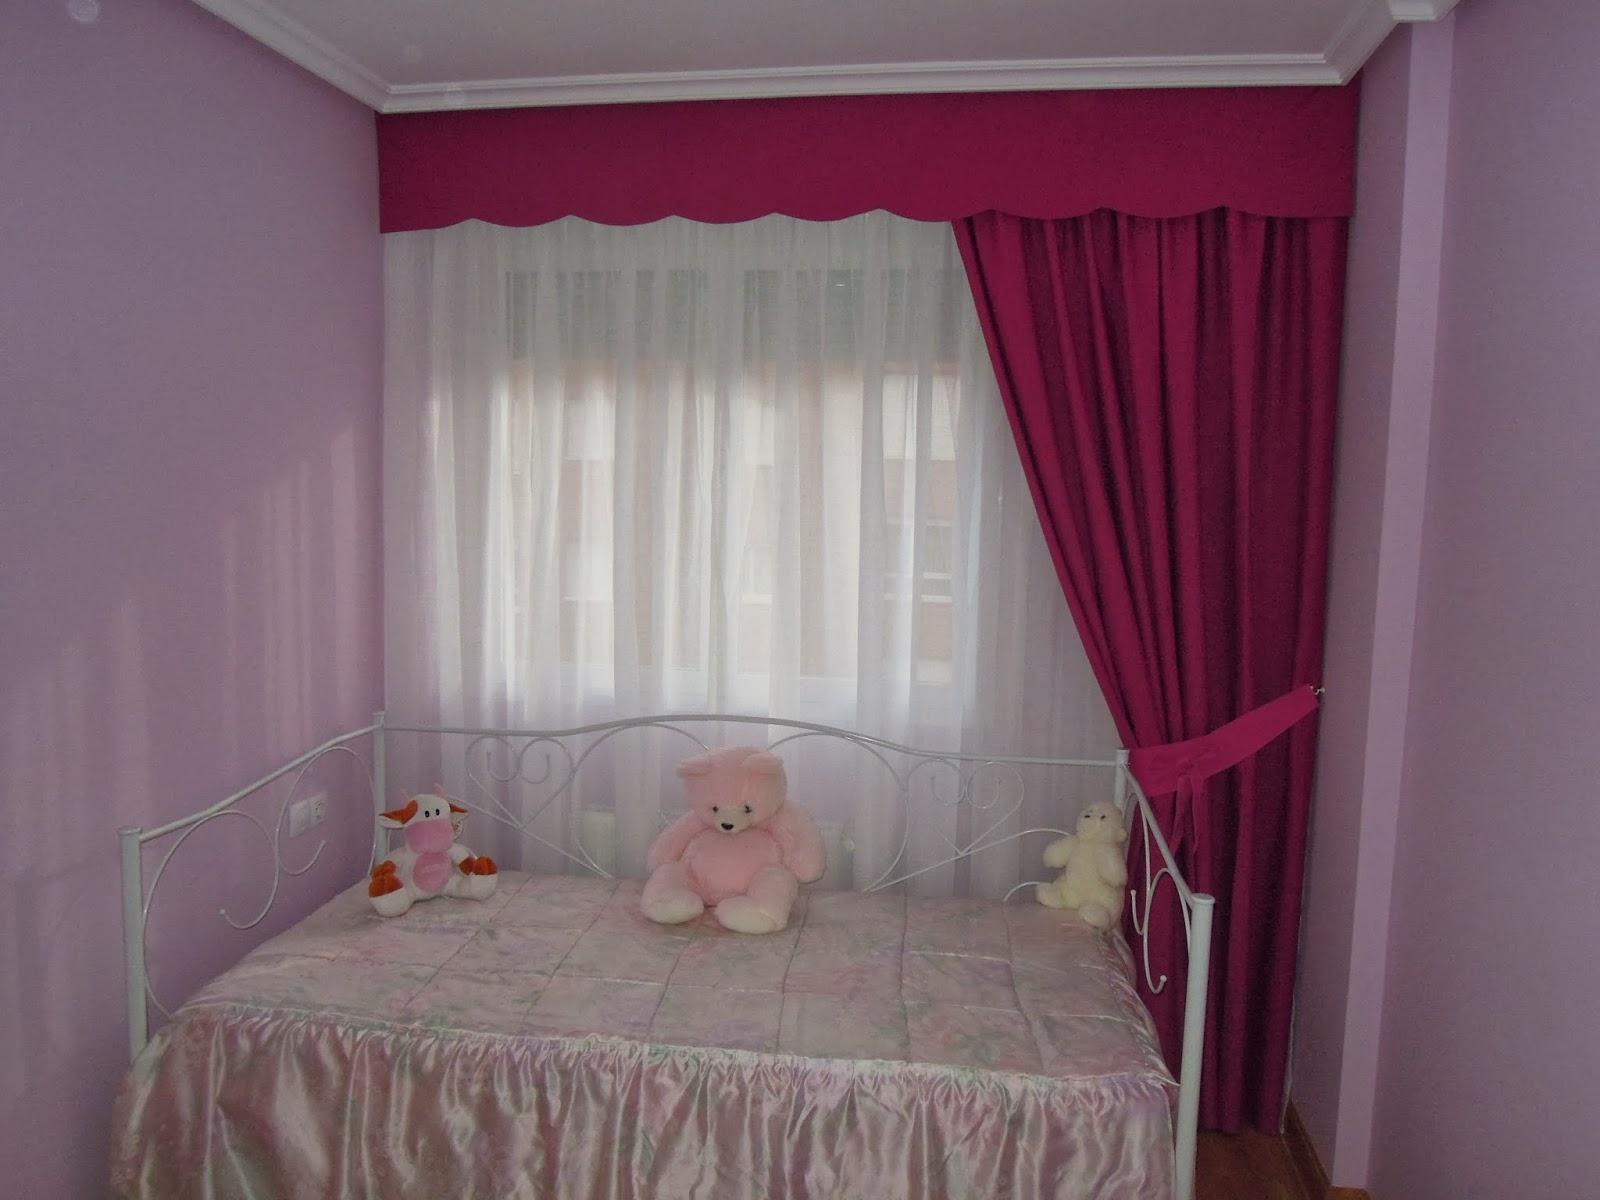 Fotos de cortinas juveniles 2013 for Cortinas en blanco